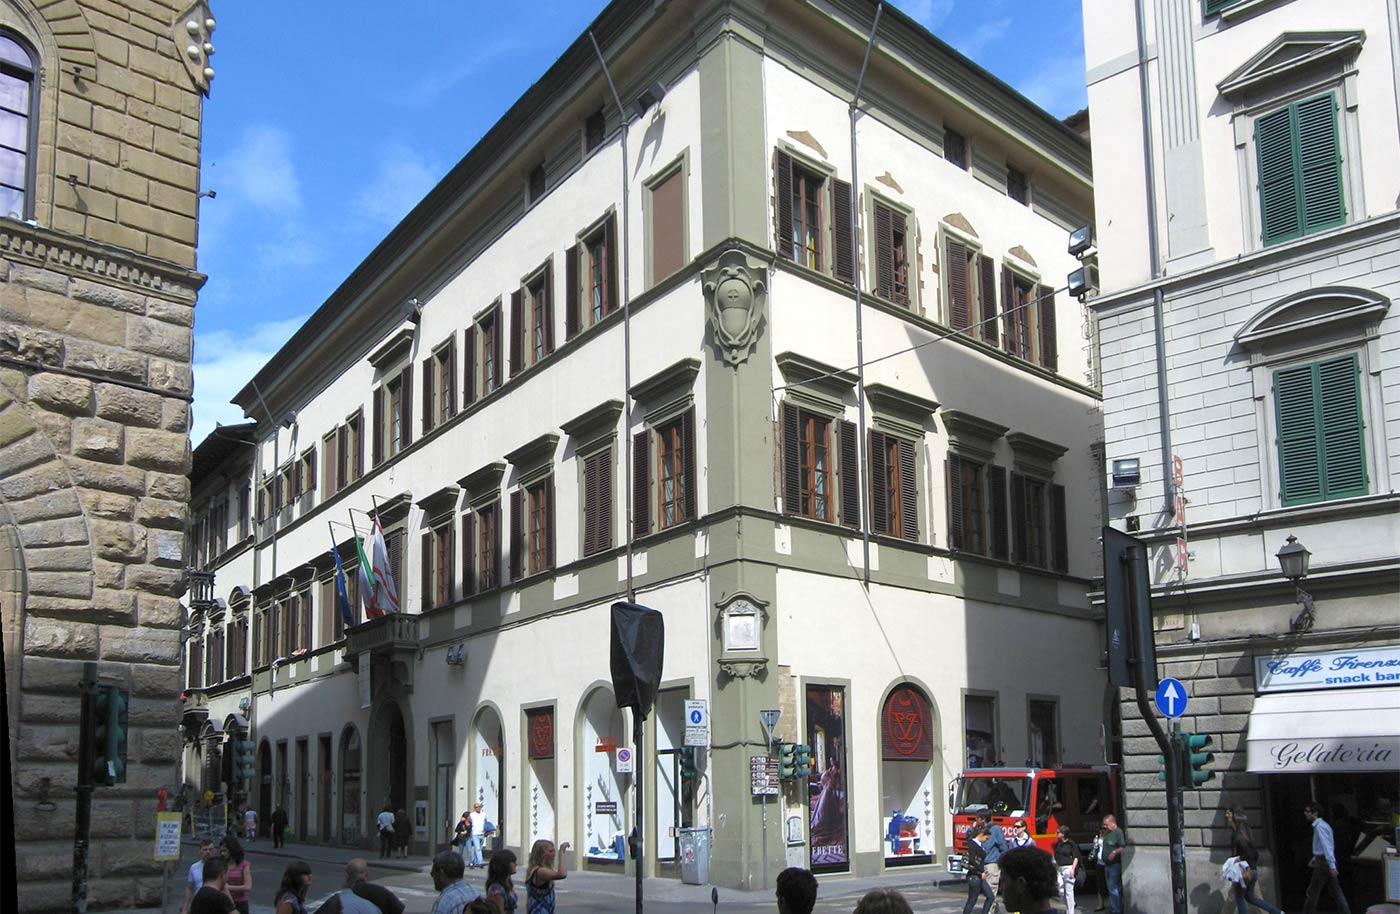 consiglio-regionale-toscana-palazzo-panciatichi